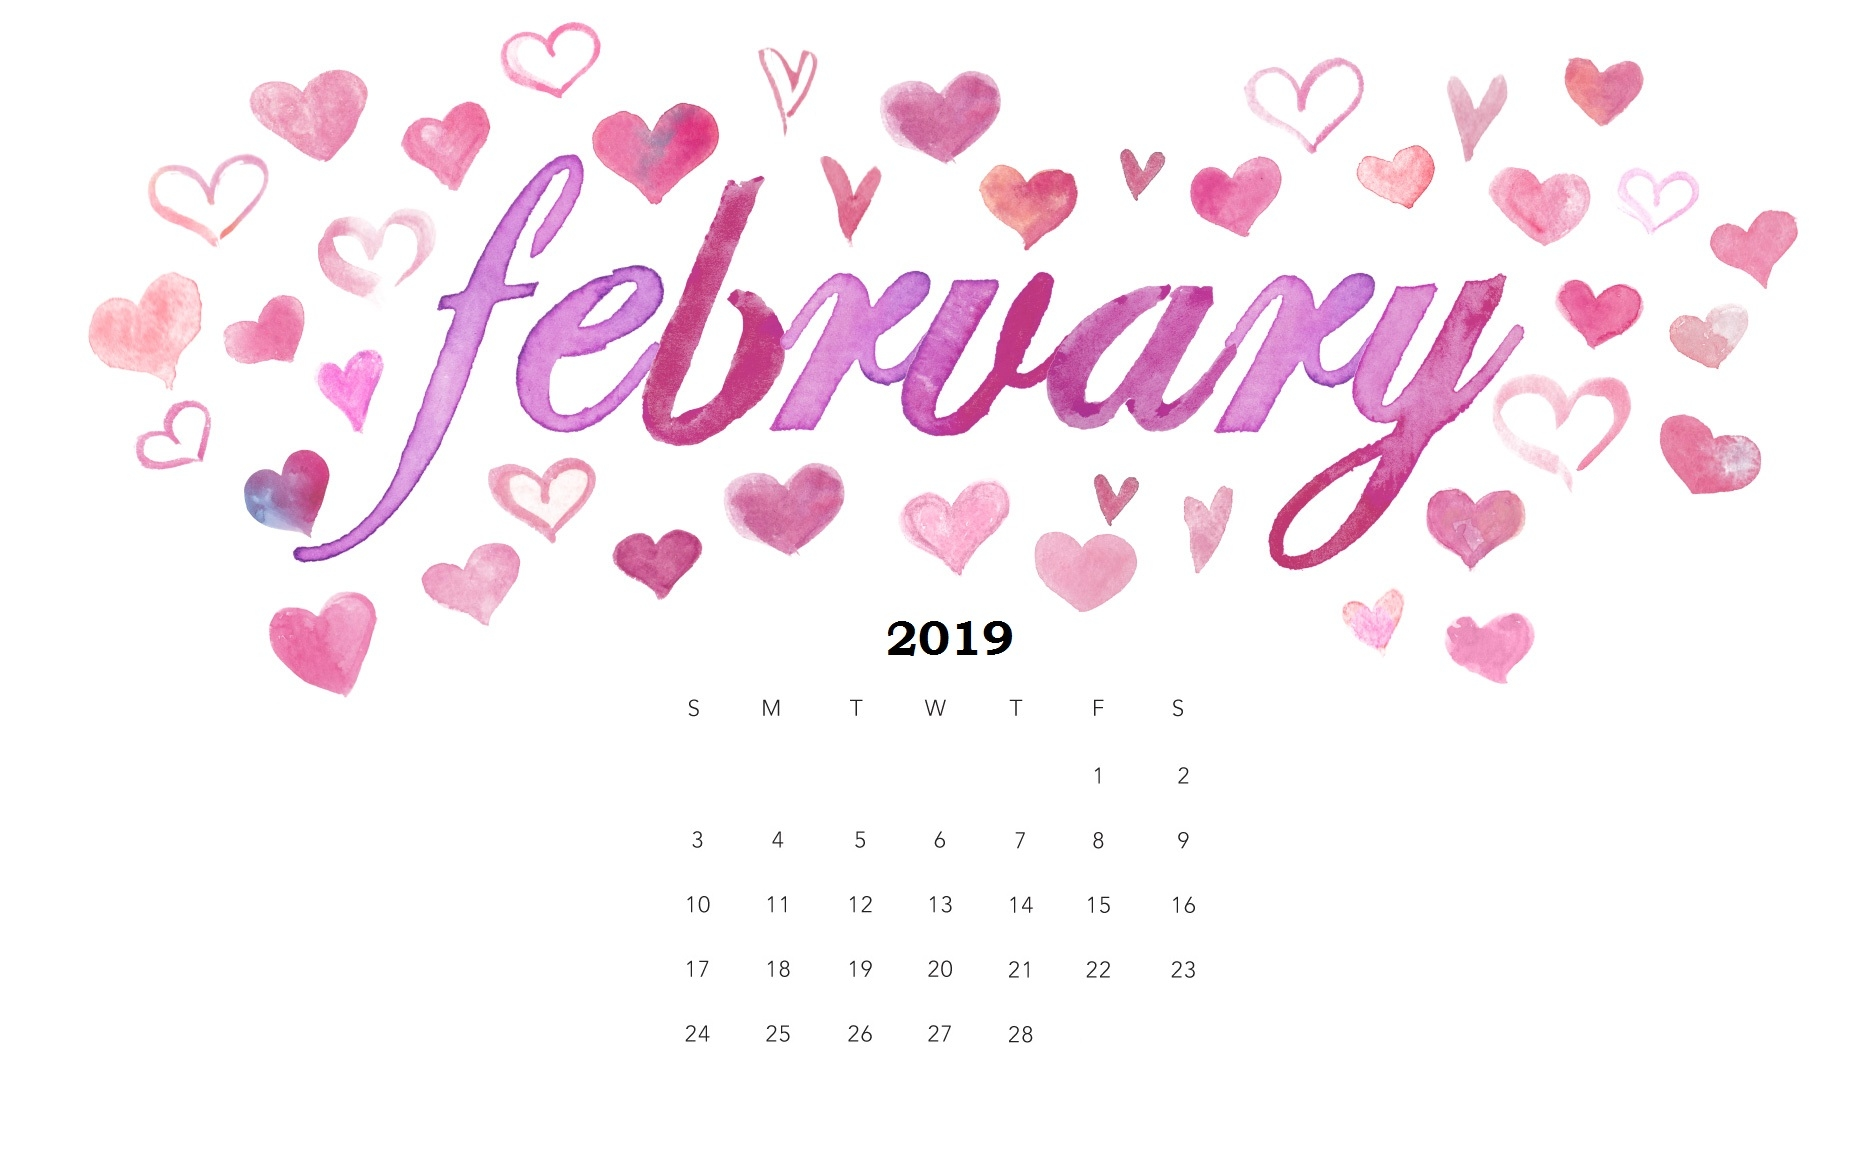 february 2019 calendar::Cute February 2019 Calendar